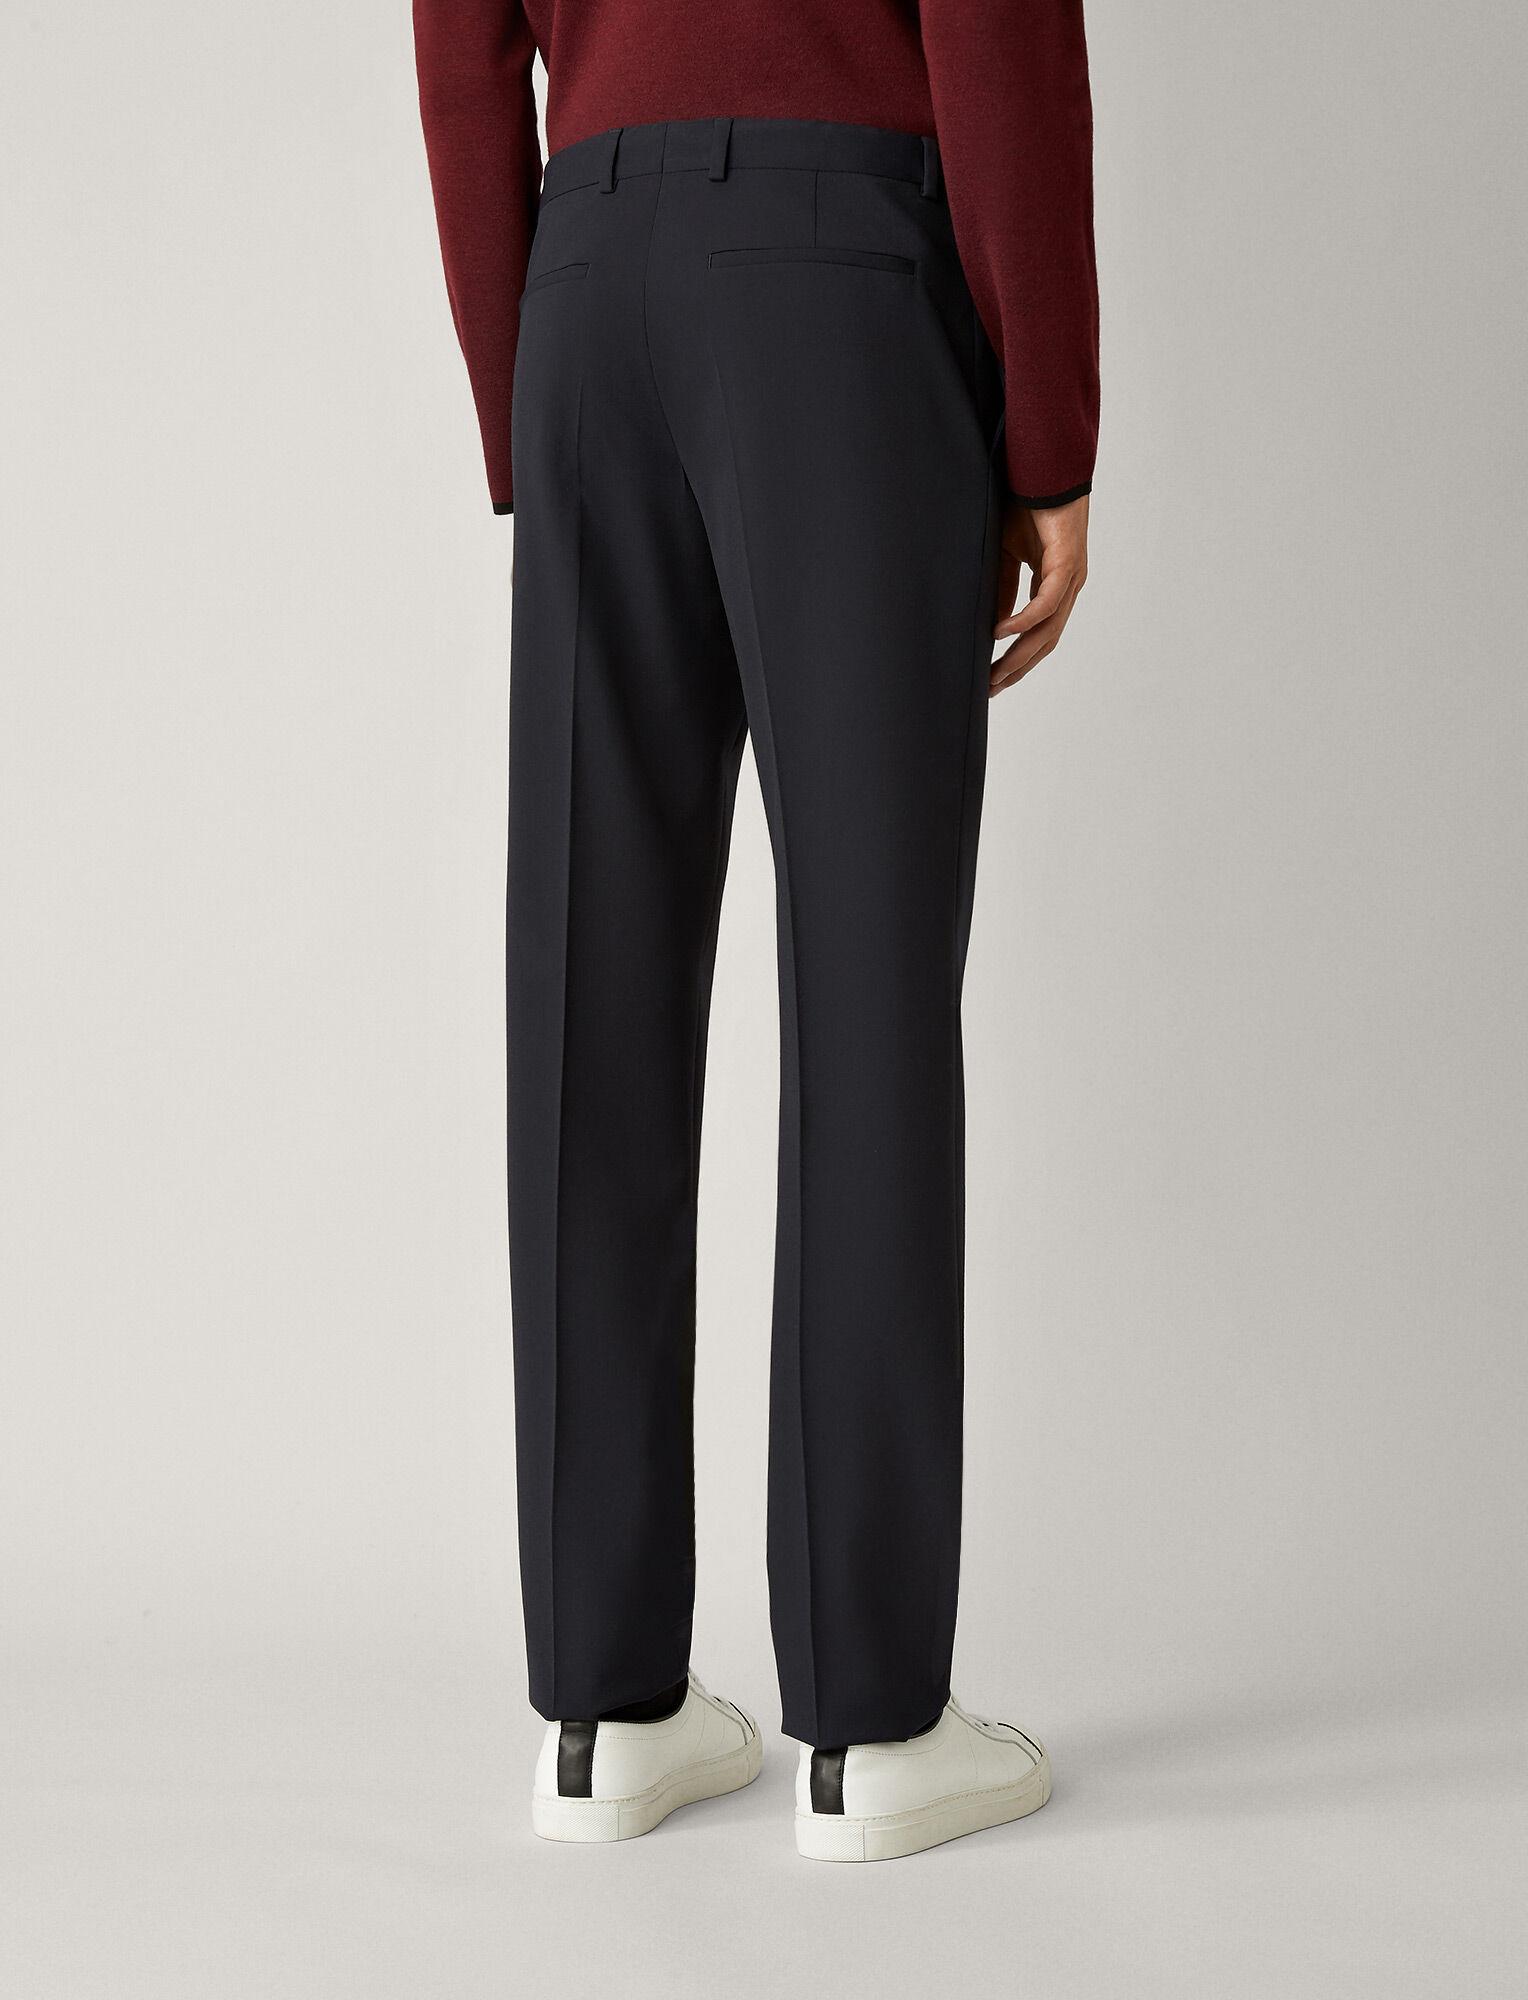 Joseph, Jack Techno Wool Stretch Trousers, in NAVY